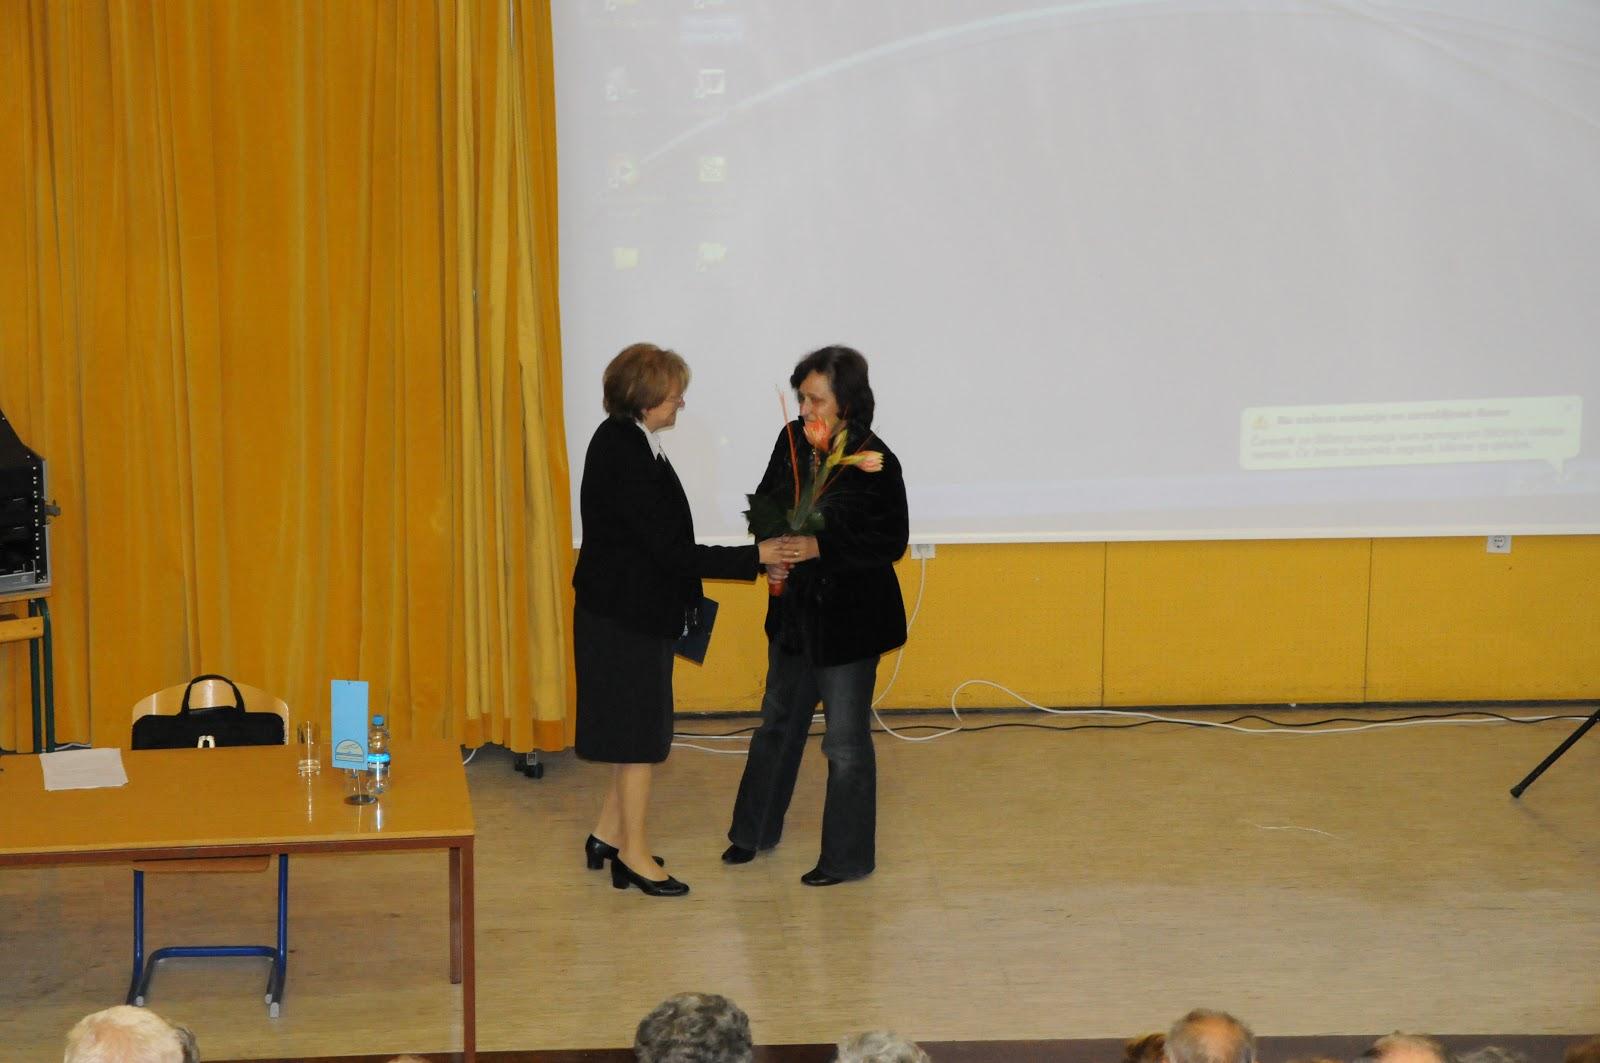 Predavanje, dr. Camlek - oktober 2011 - DSC_3894.JPG